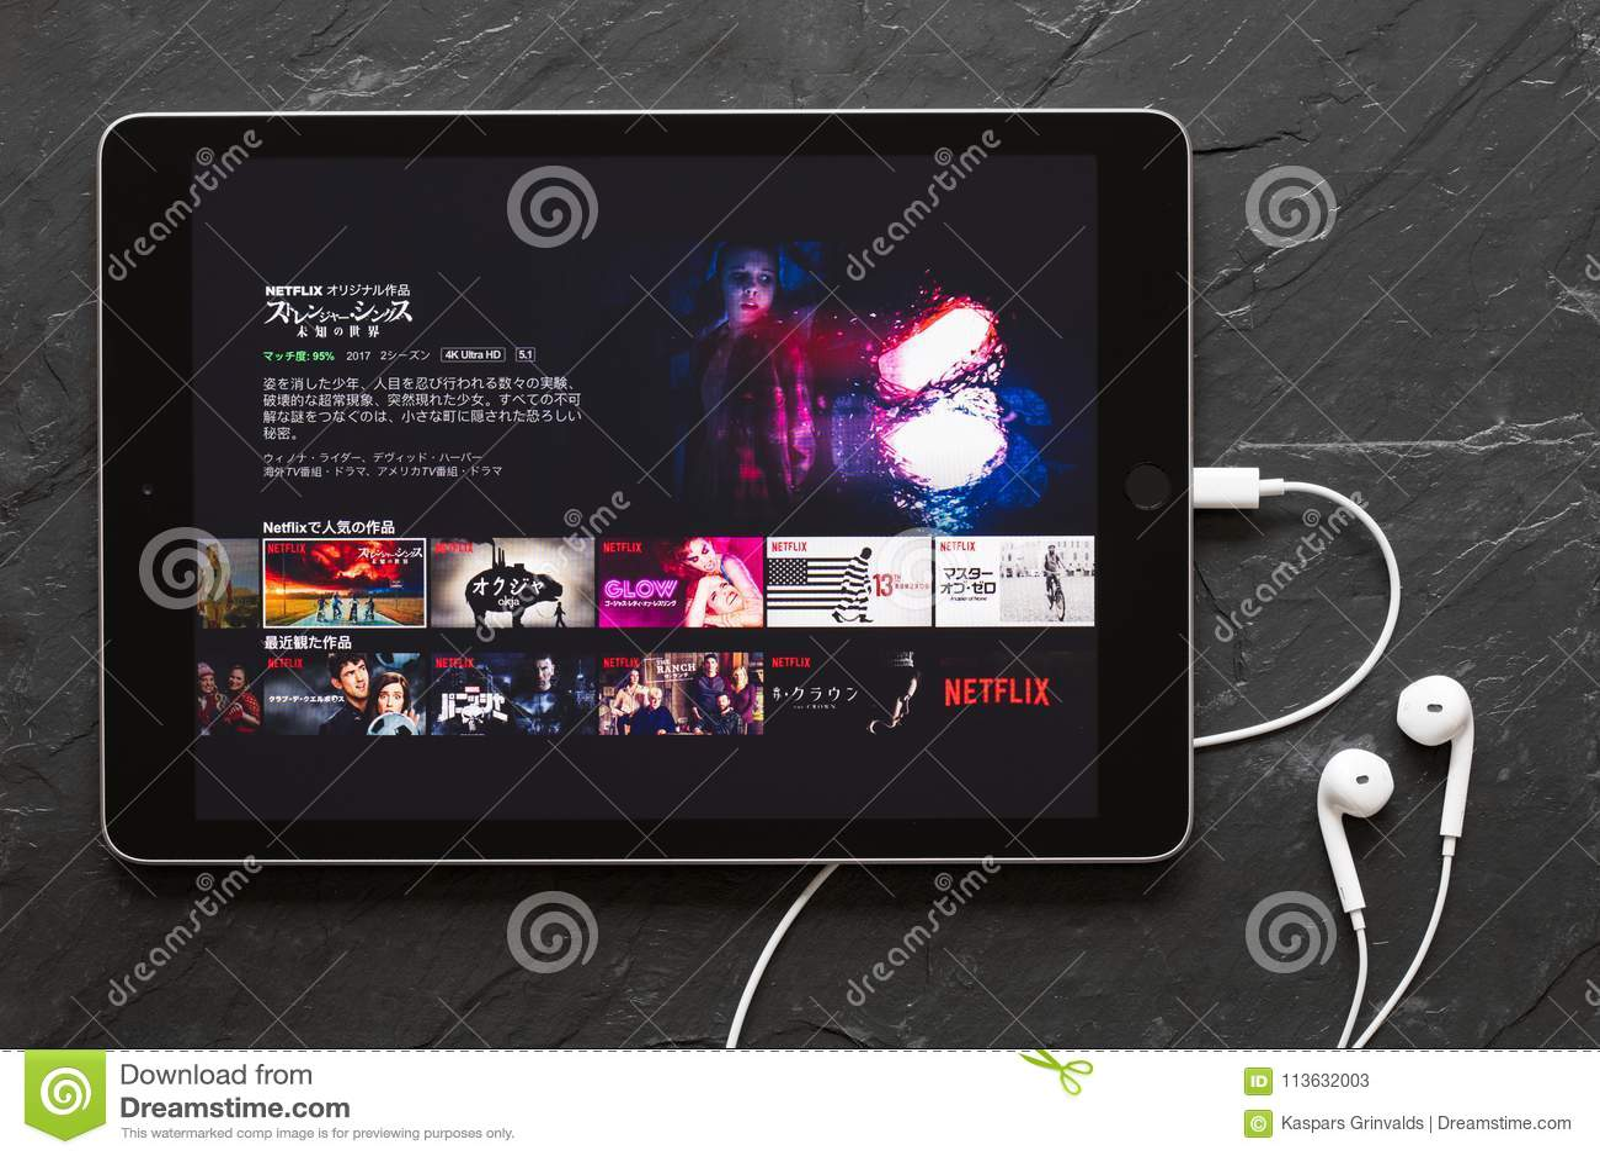 netflix download app for ipad